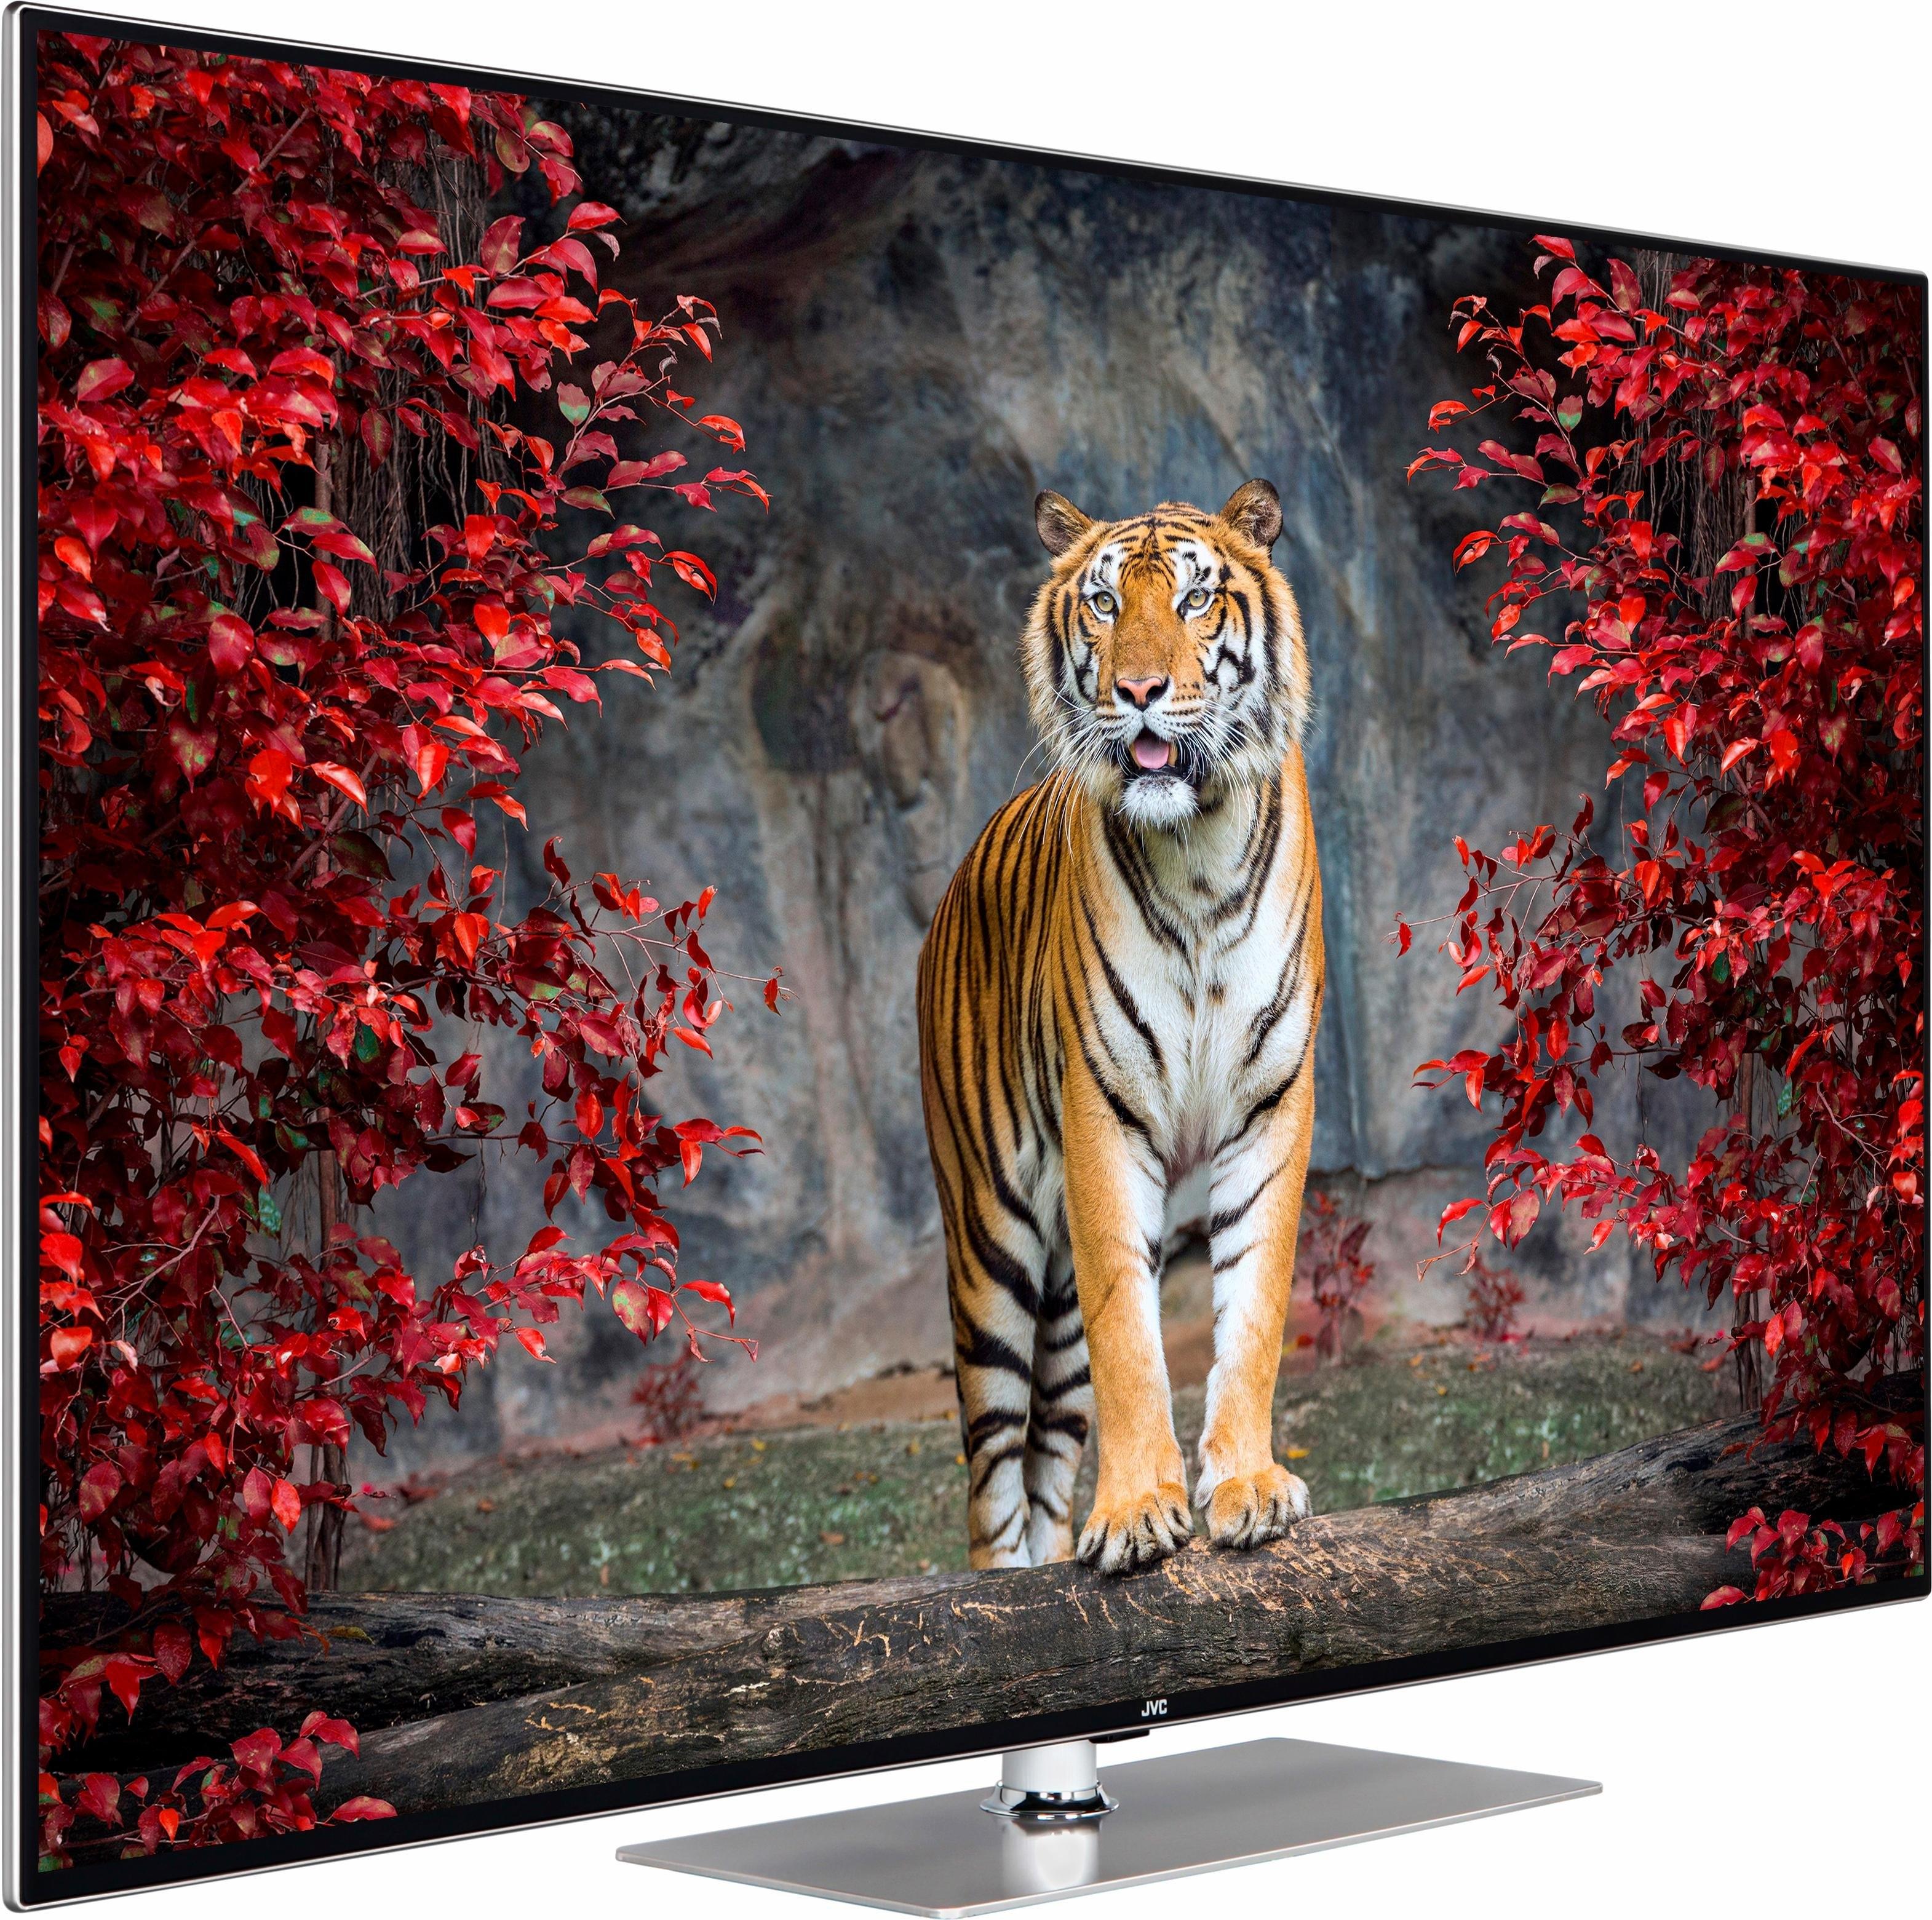 JVC LT-65VU92J LED-TV (165 Cm / (65 Inch)), 4K Ultra HD